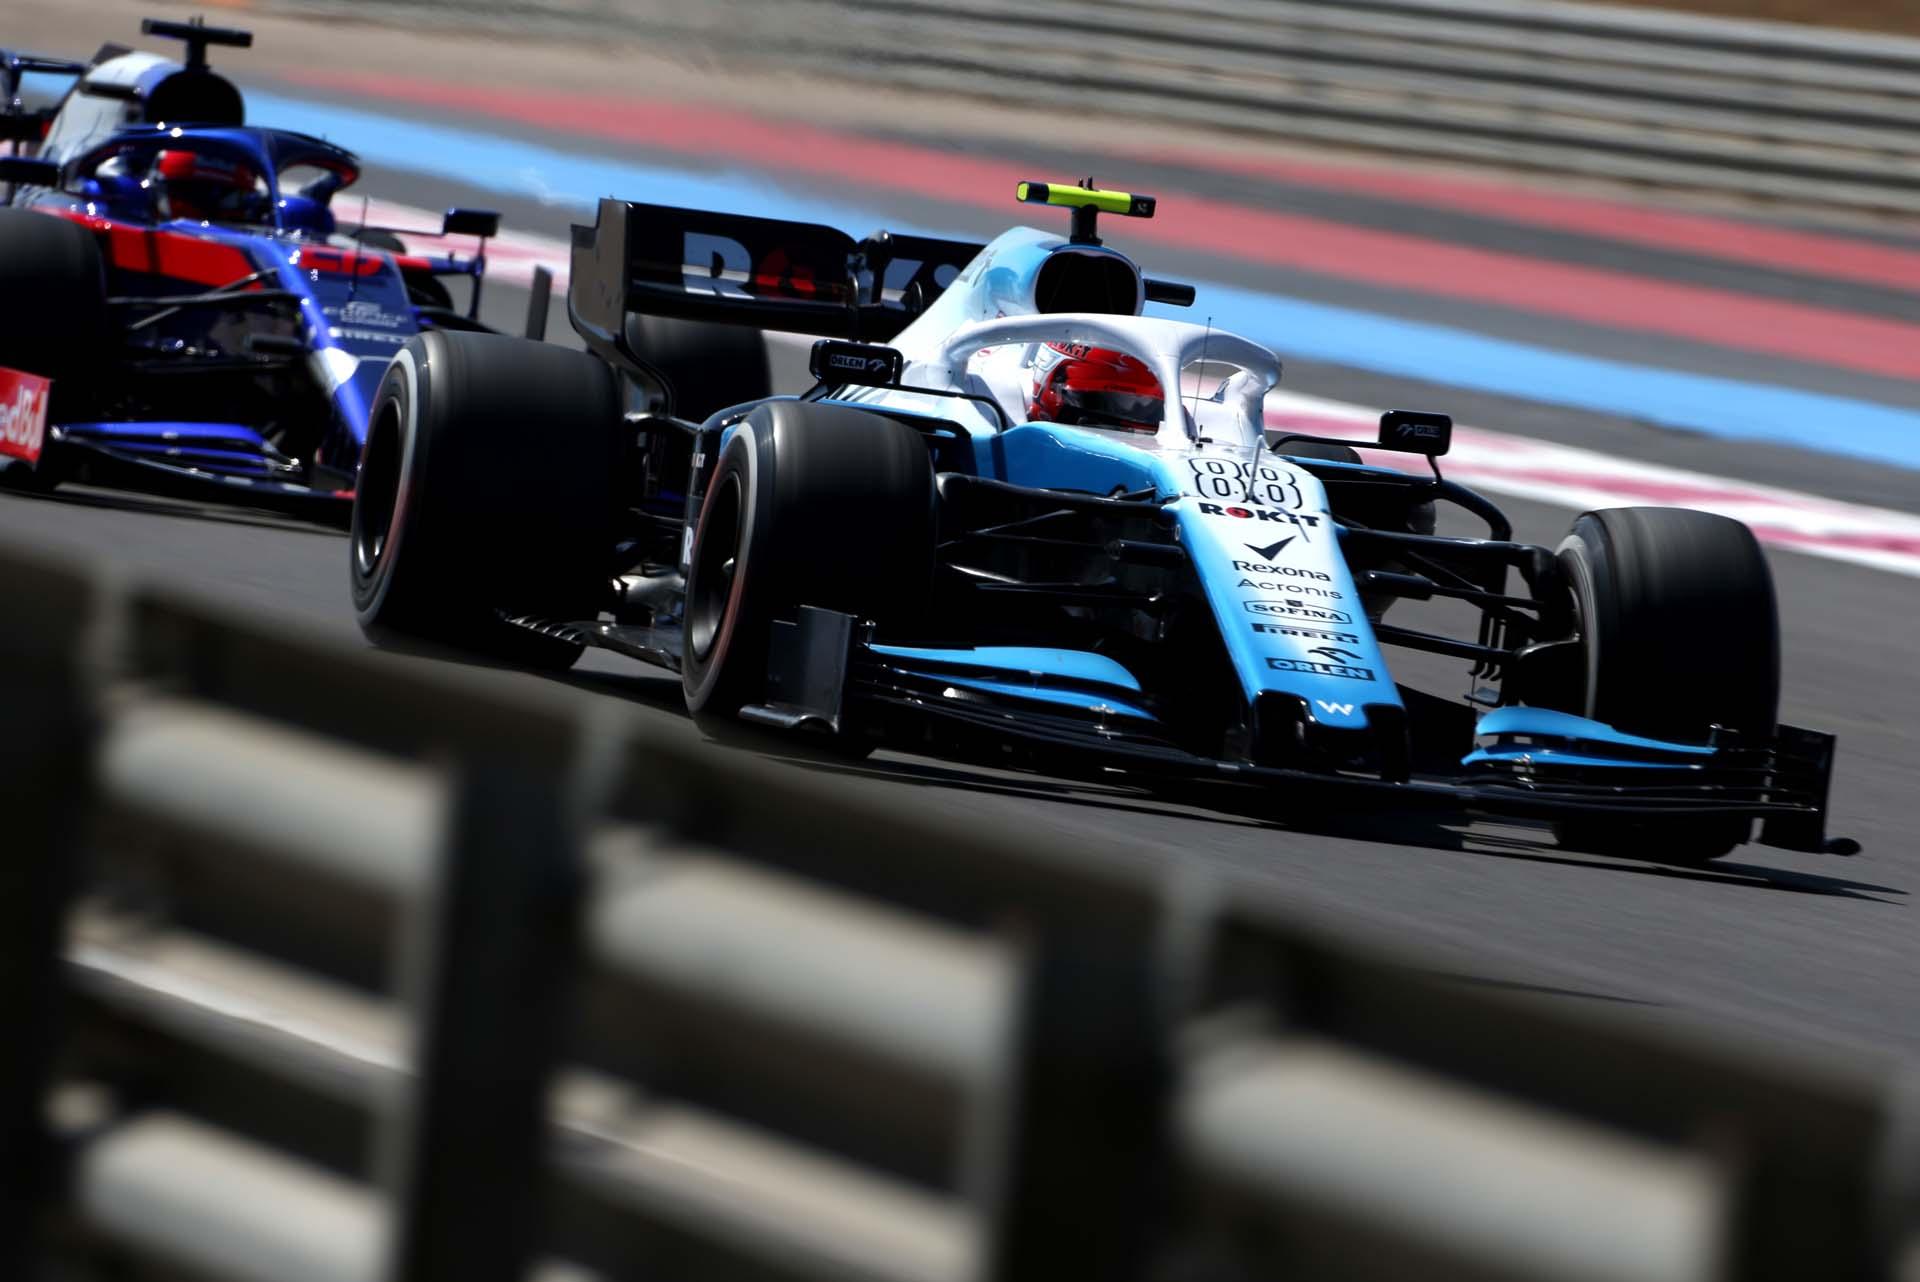 Robert Kubica (POL) Williams Racing FW42. French Grand Prix, Friday 21st June 2019. Paul Ricard, France.